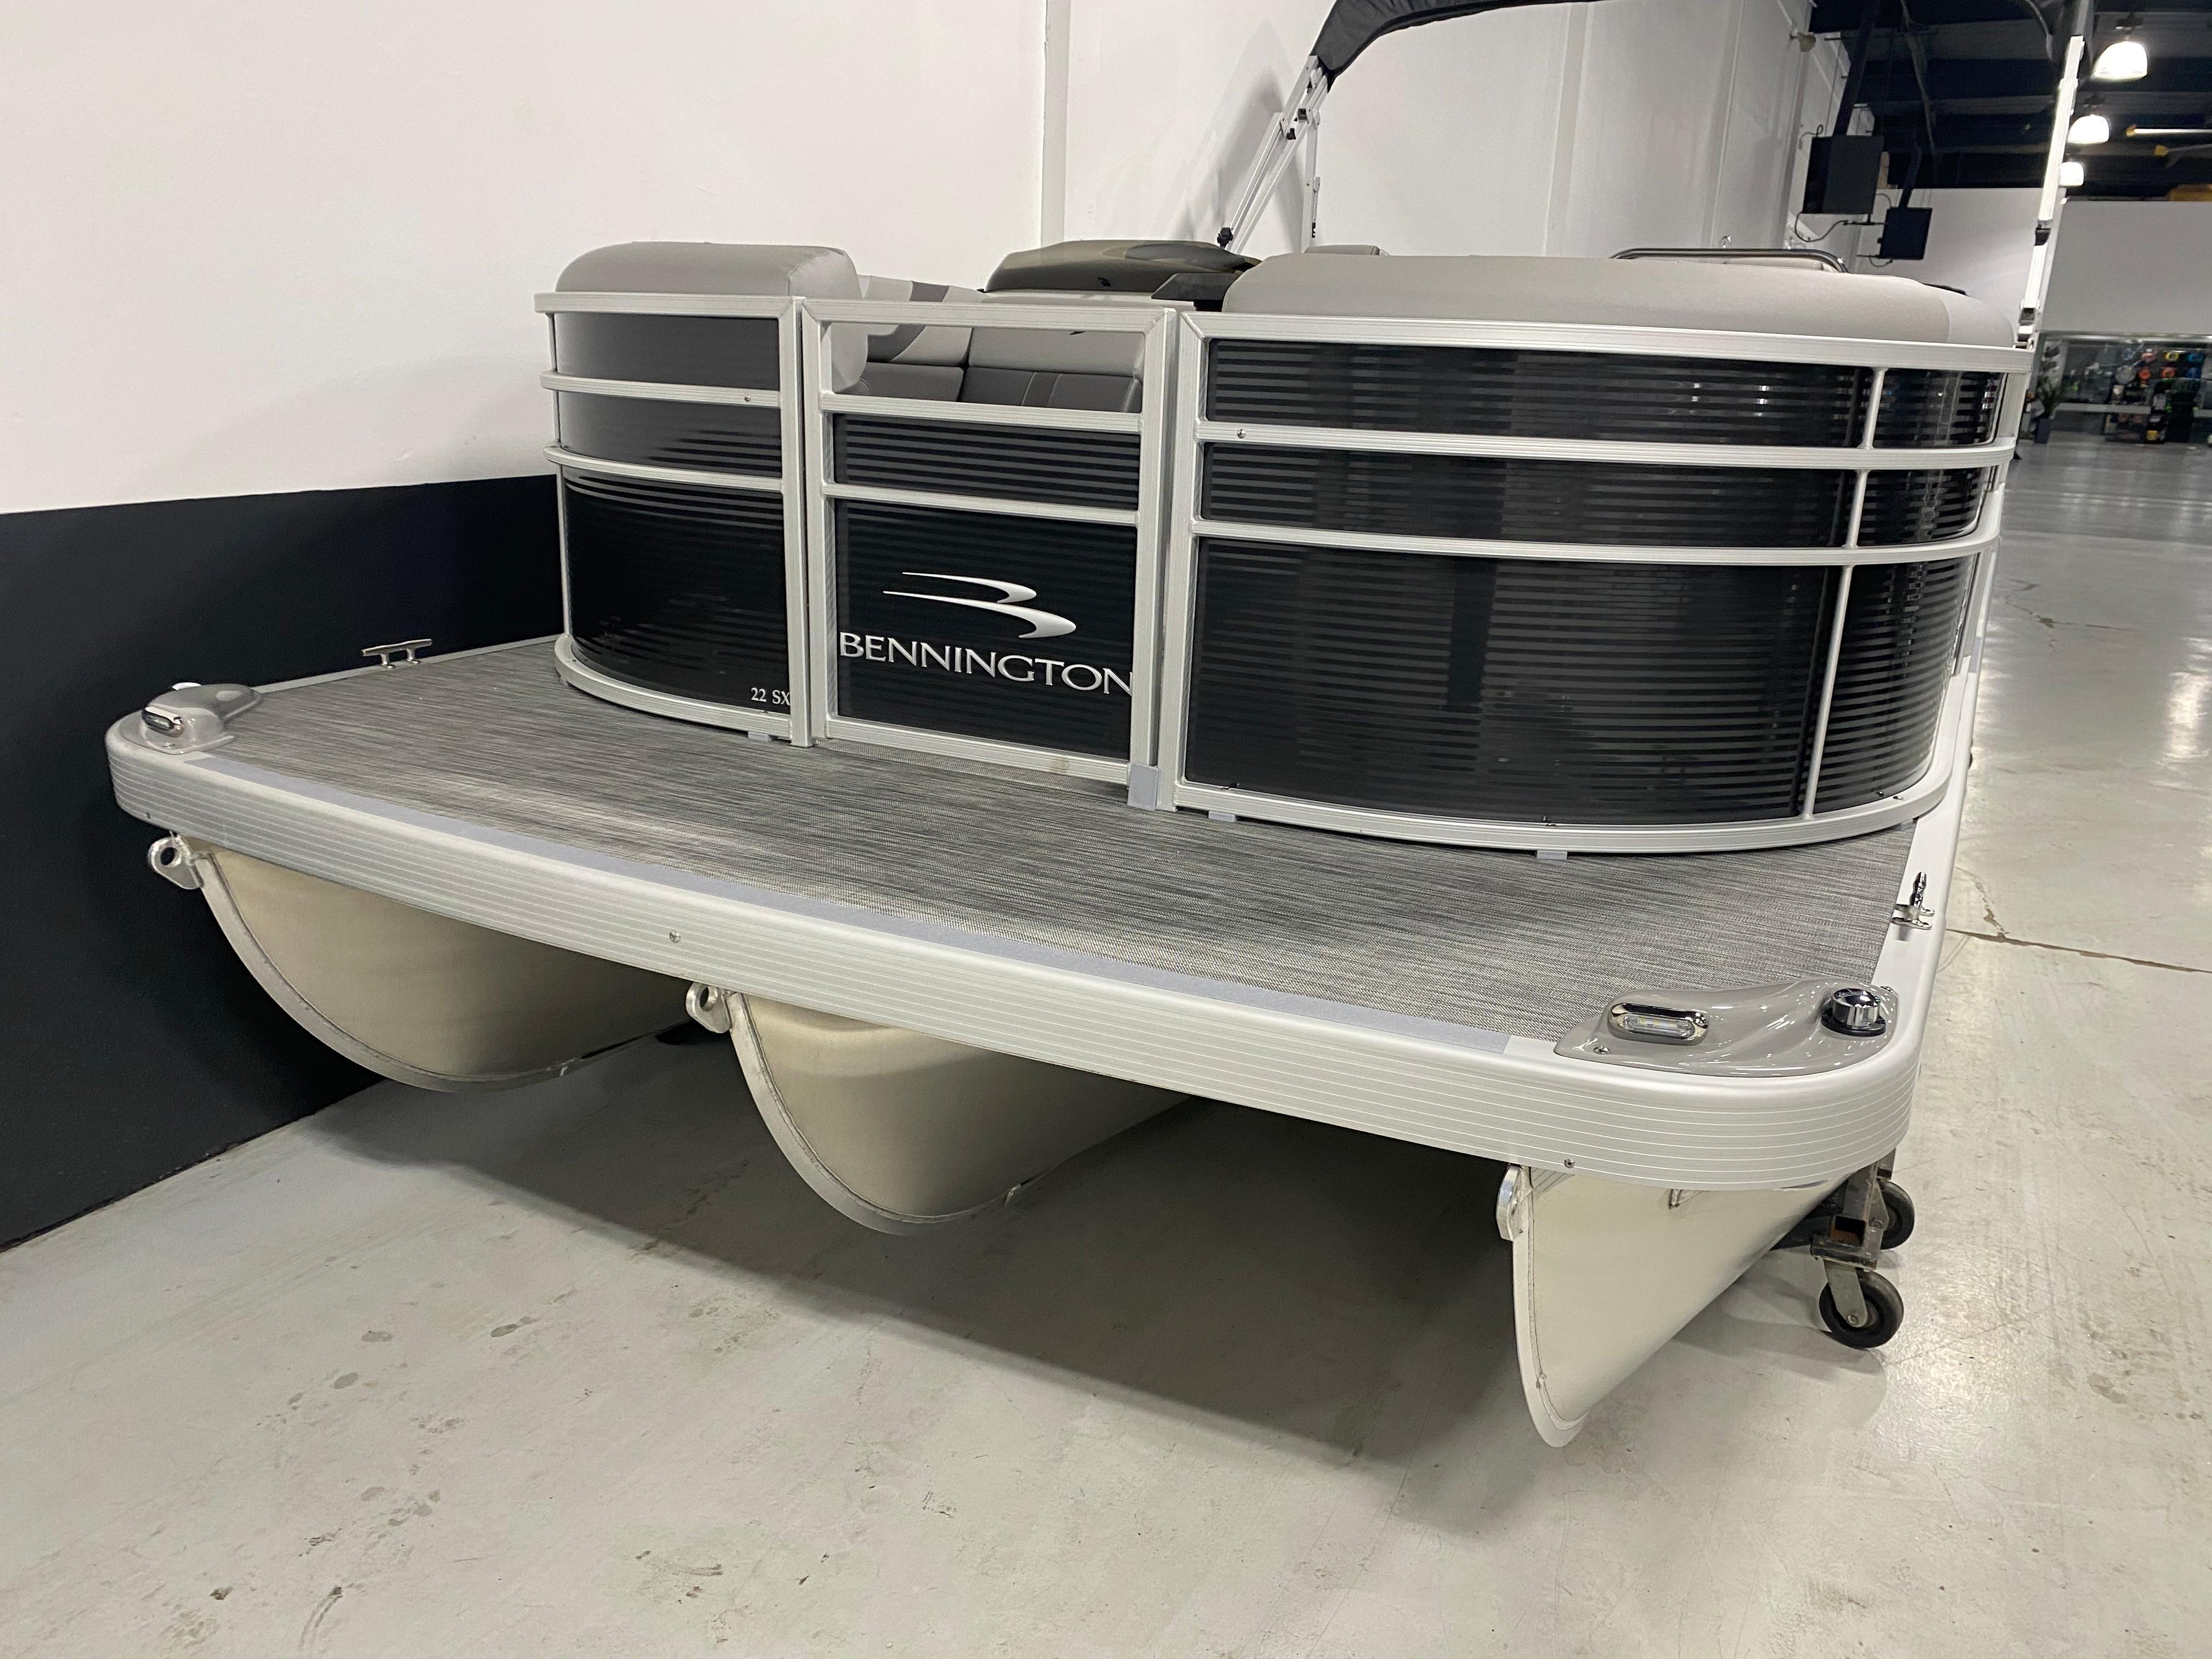 2021 Bennington 22 SSRX SPS #B2557K inventory image at Sun Country Inland in Lake Havasu City